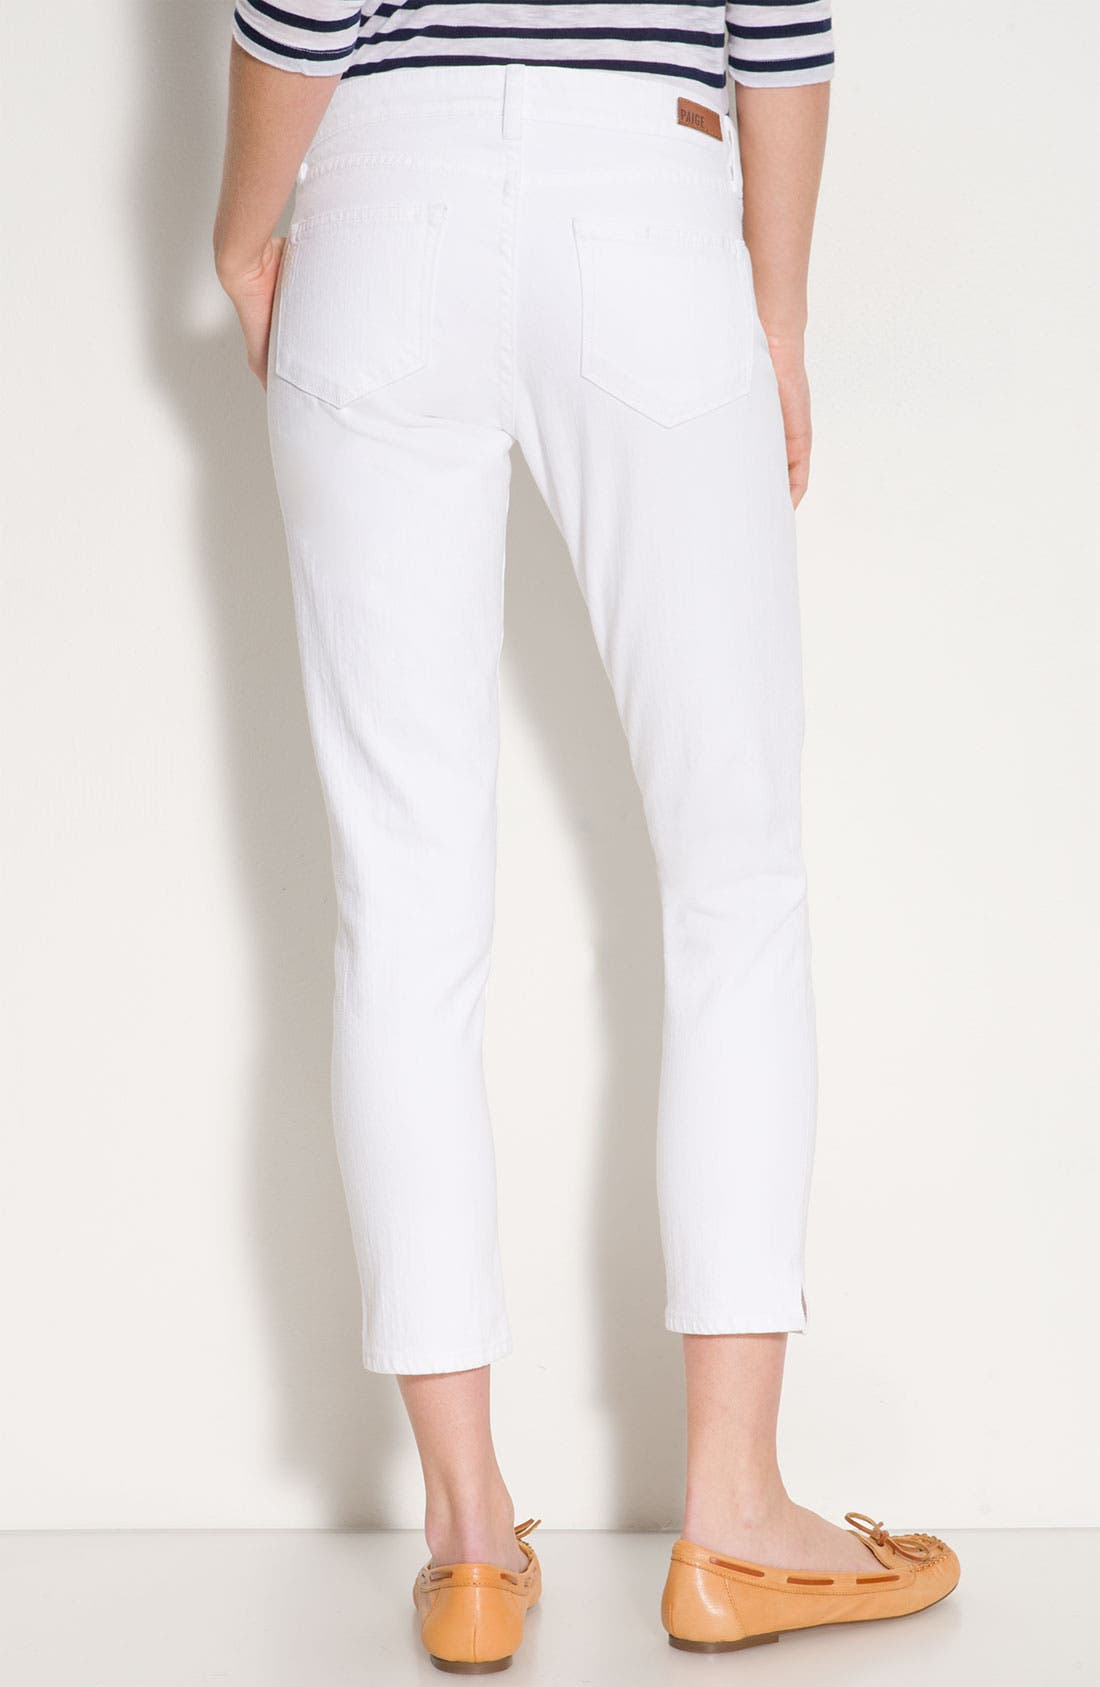 Alternate Image 1 Selected - Paige Denim 'Kylie' Crop Skinny Jeans (Optic White Wash)